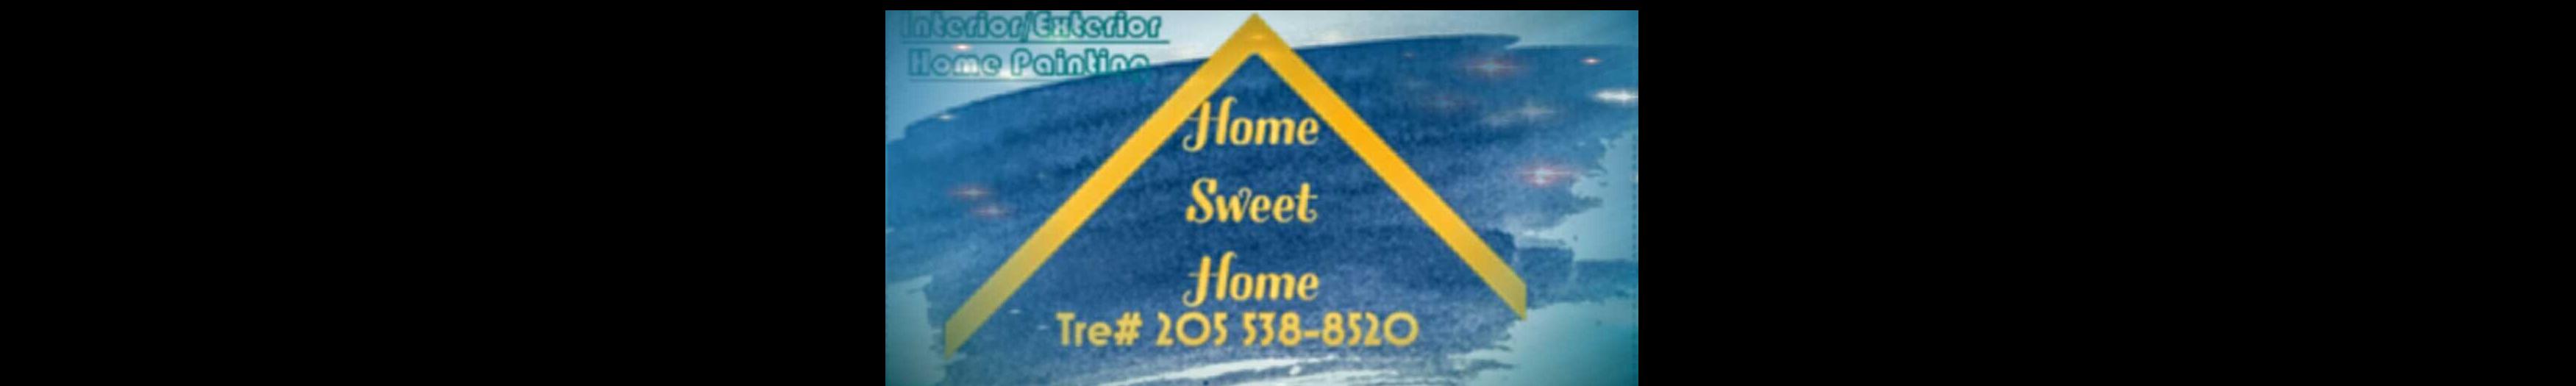 Home Sweet Home, LLC Birmingham, AL, 35214   Networx